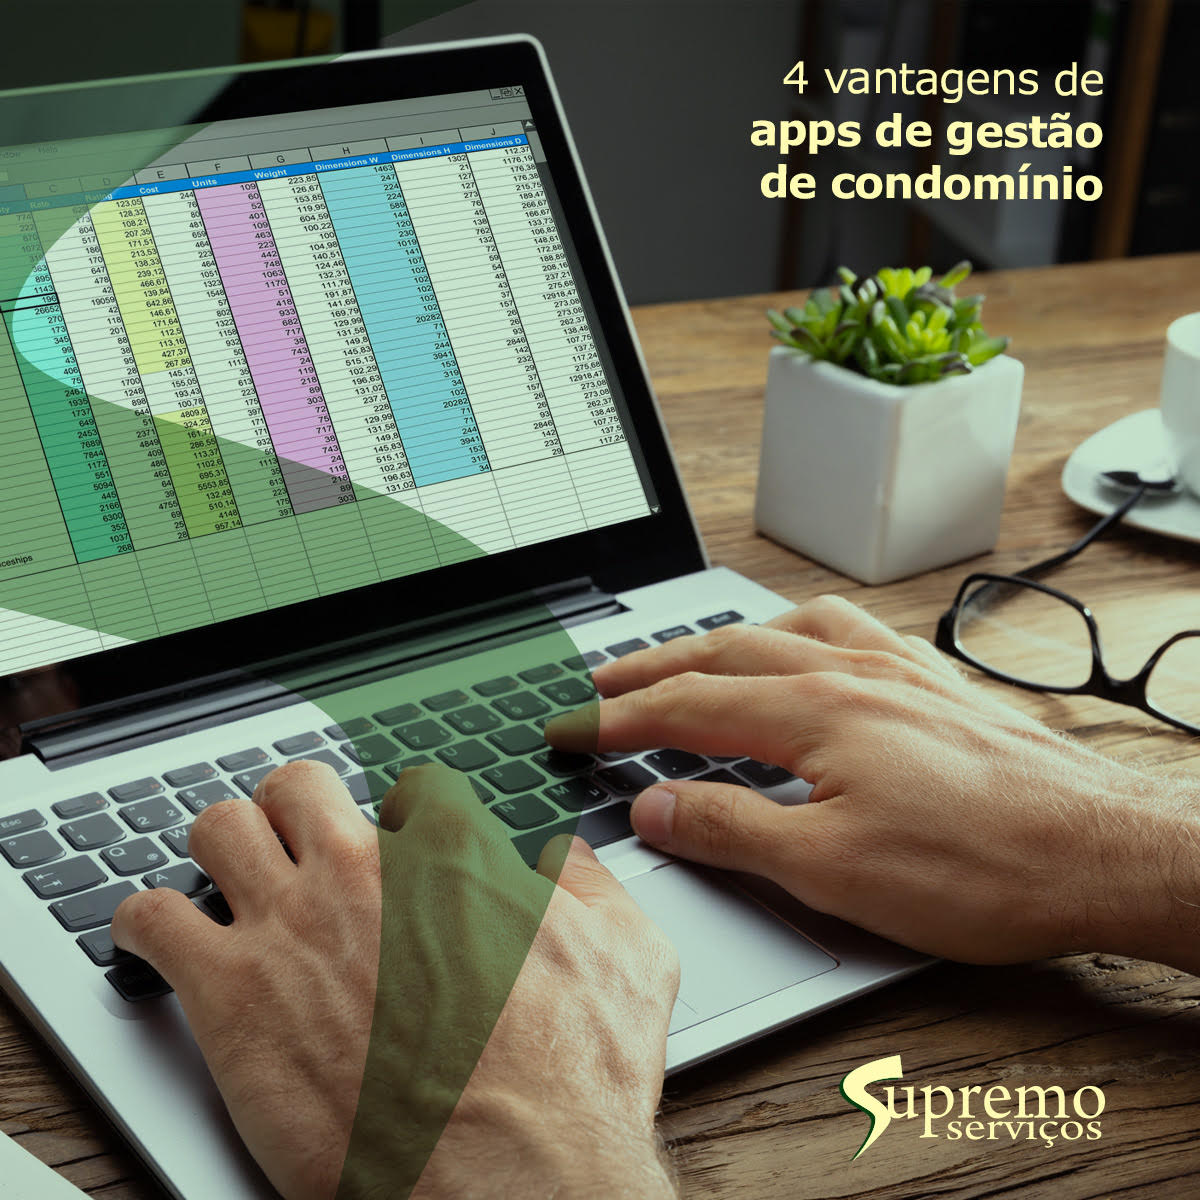 apps-para-gestão de-condominio